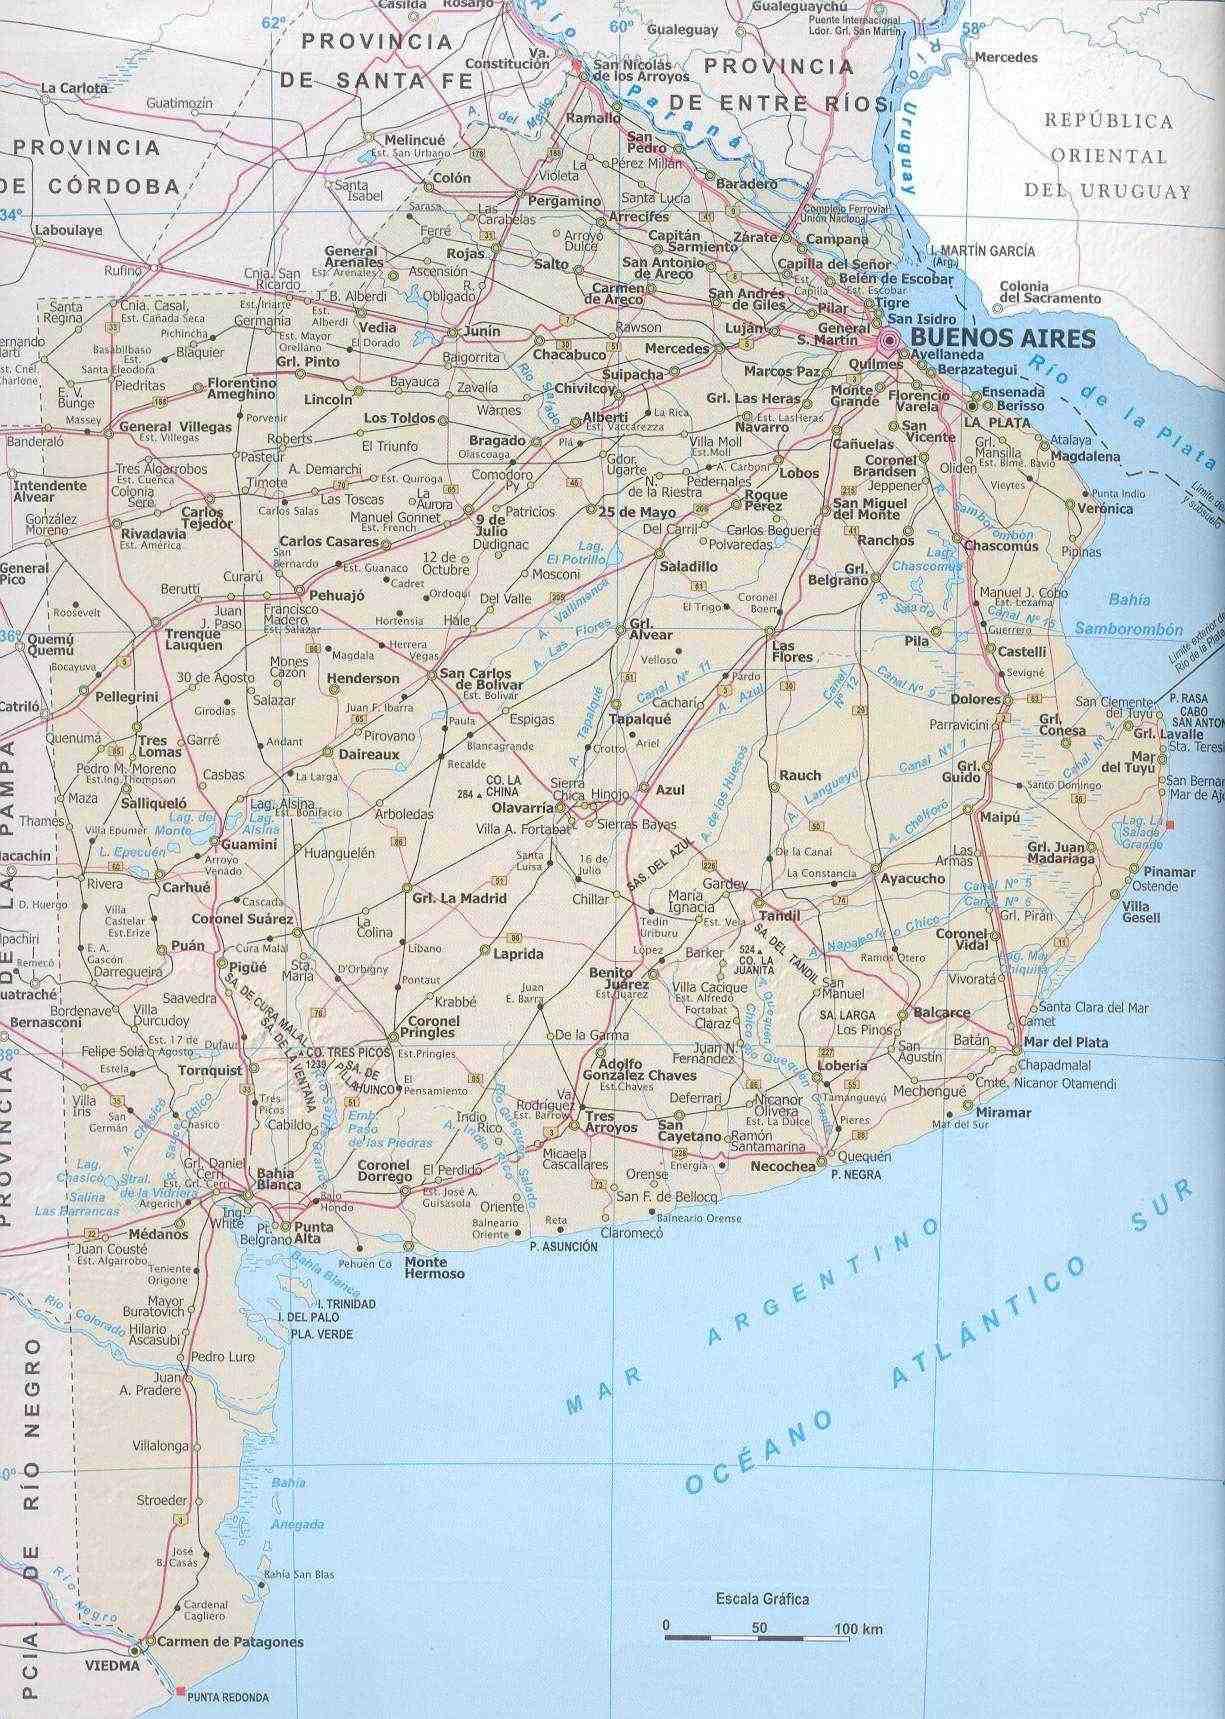 Mapa Provincia de Buenos Aires, Argentina